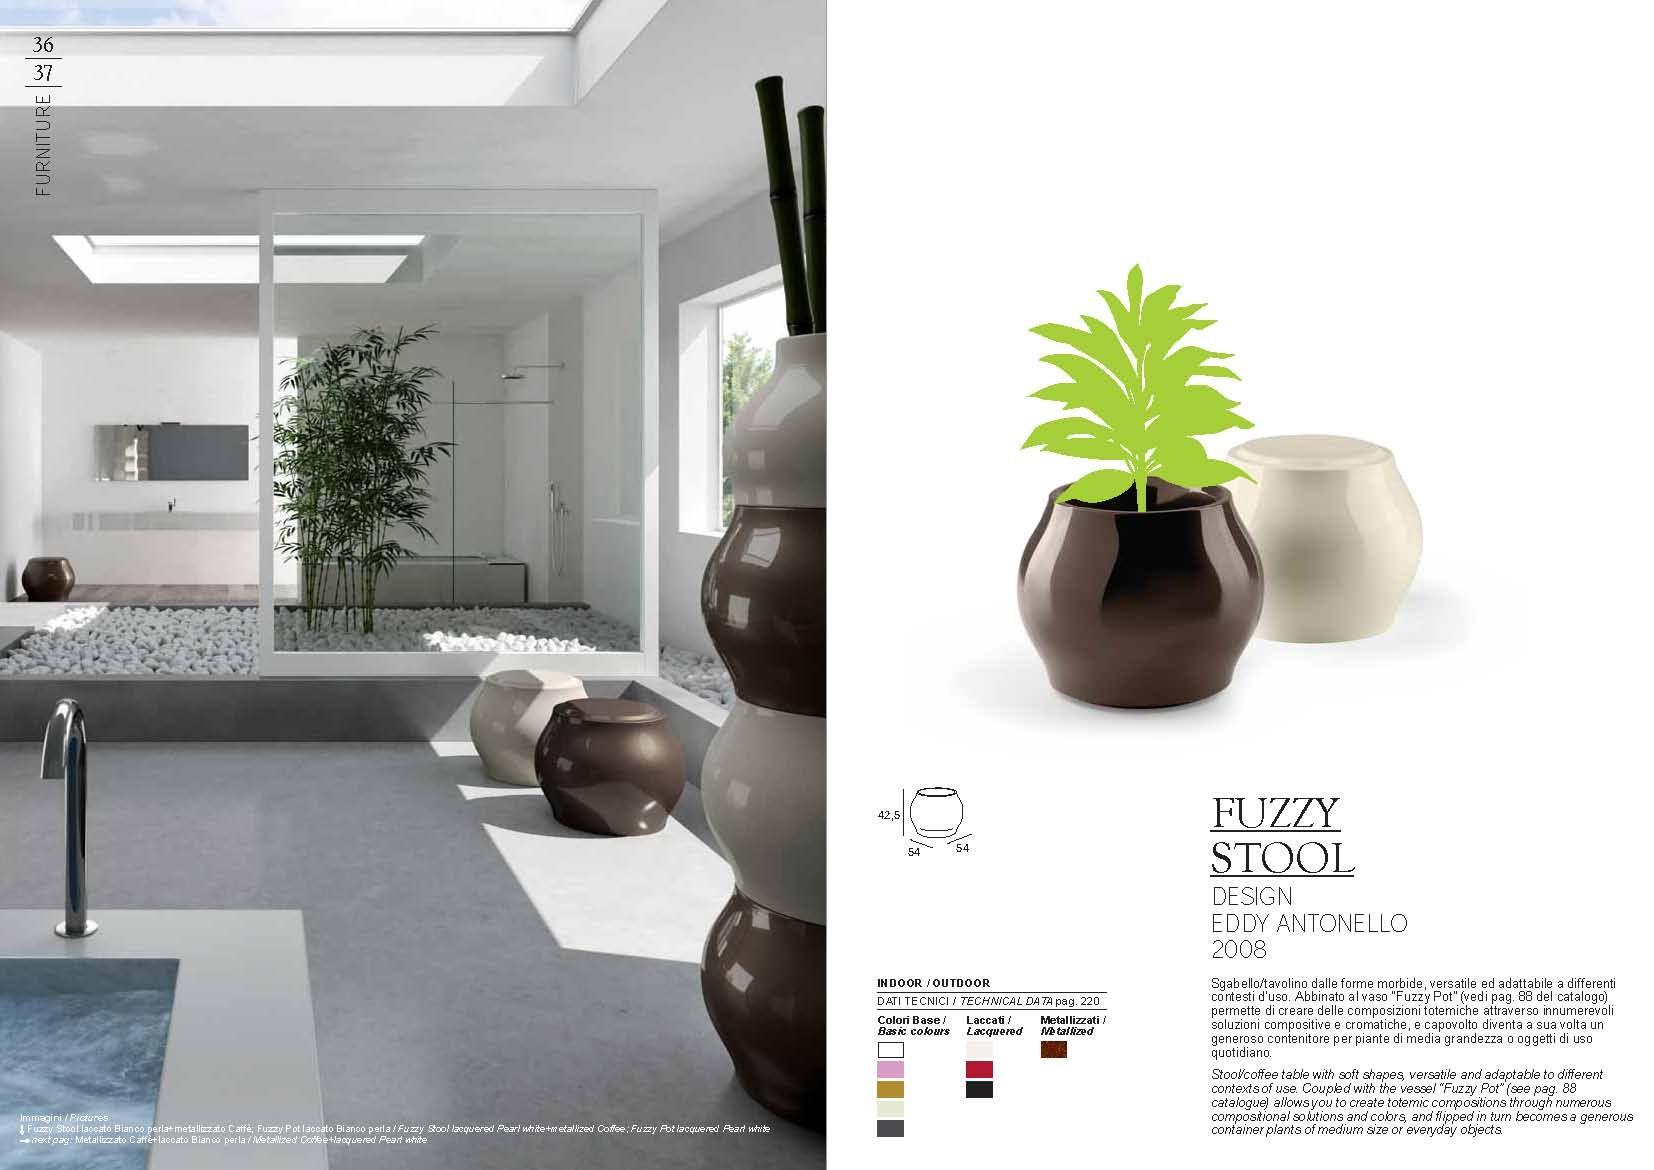 gartenm bel m bel f r restaurants plust collection fuzzy seriedie m bel aus italien. Black Bedroom Furniture Sets. Home Design Ideas